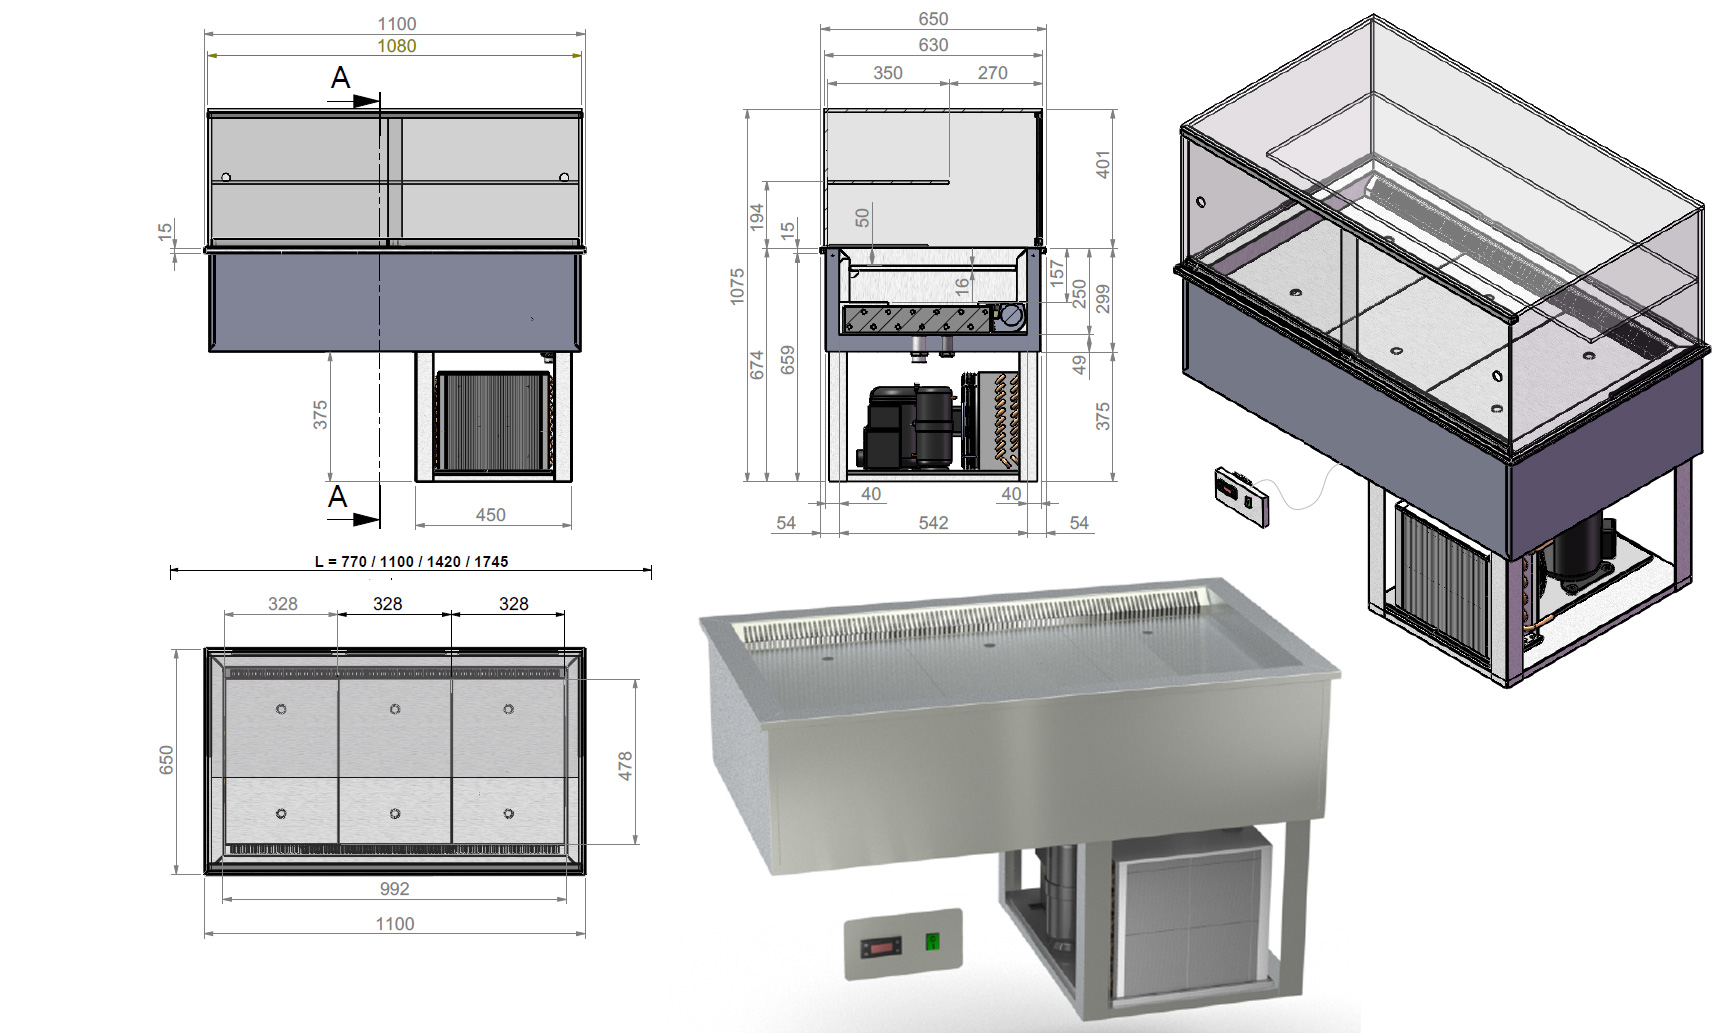 vitrine r frig r e encastrable sur mesure comptoir ventil extra plat. Black Bedroom Furniture Sets. Home Design Ideas